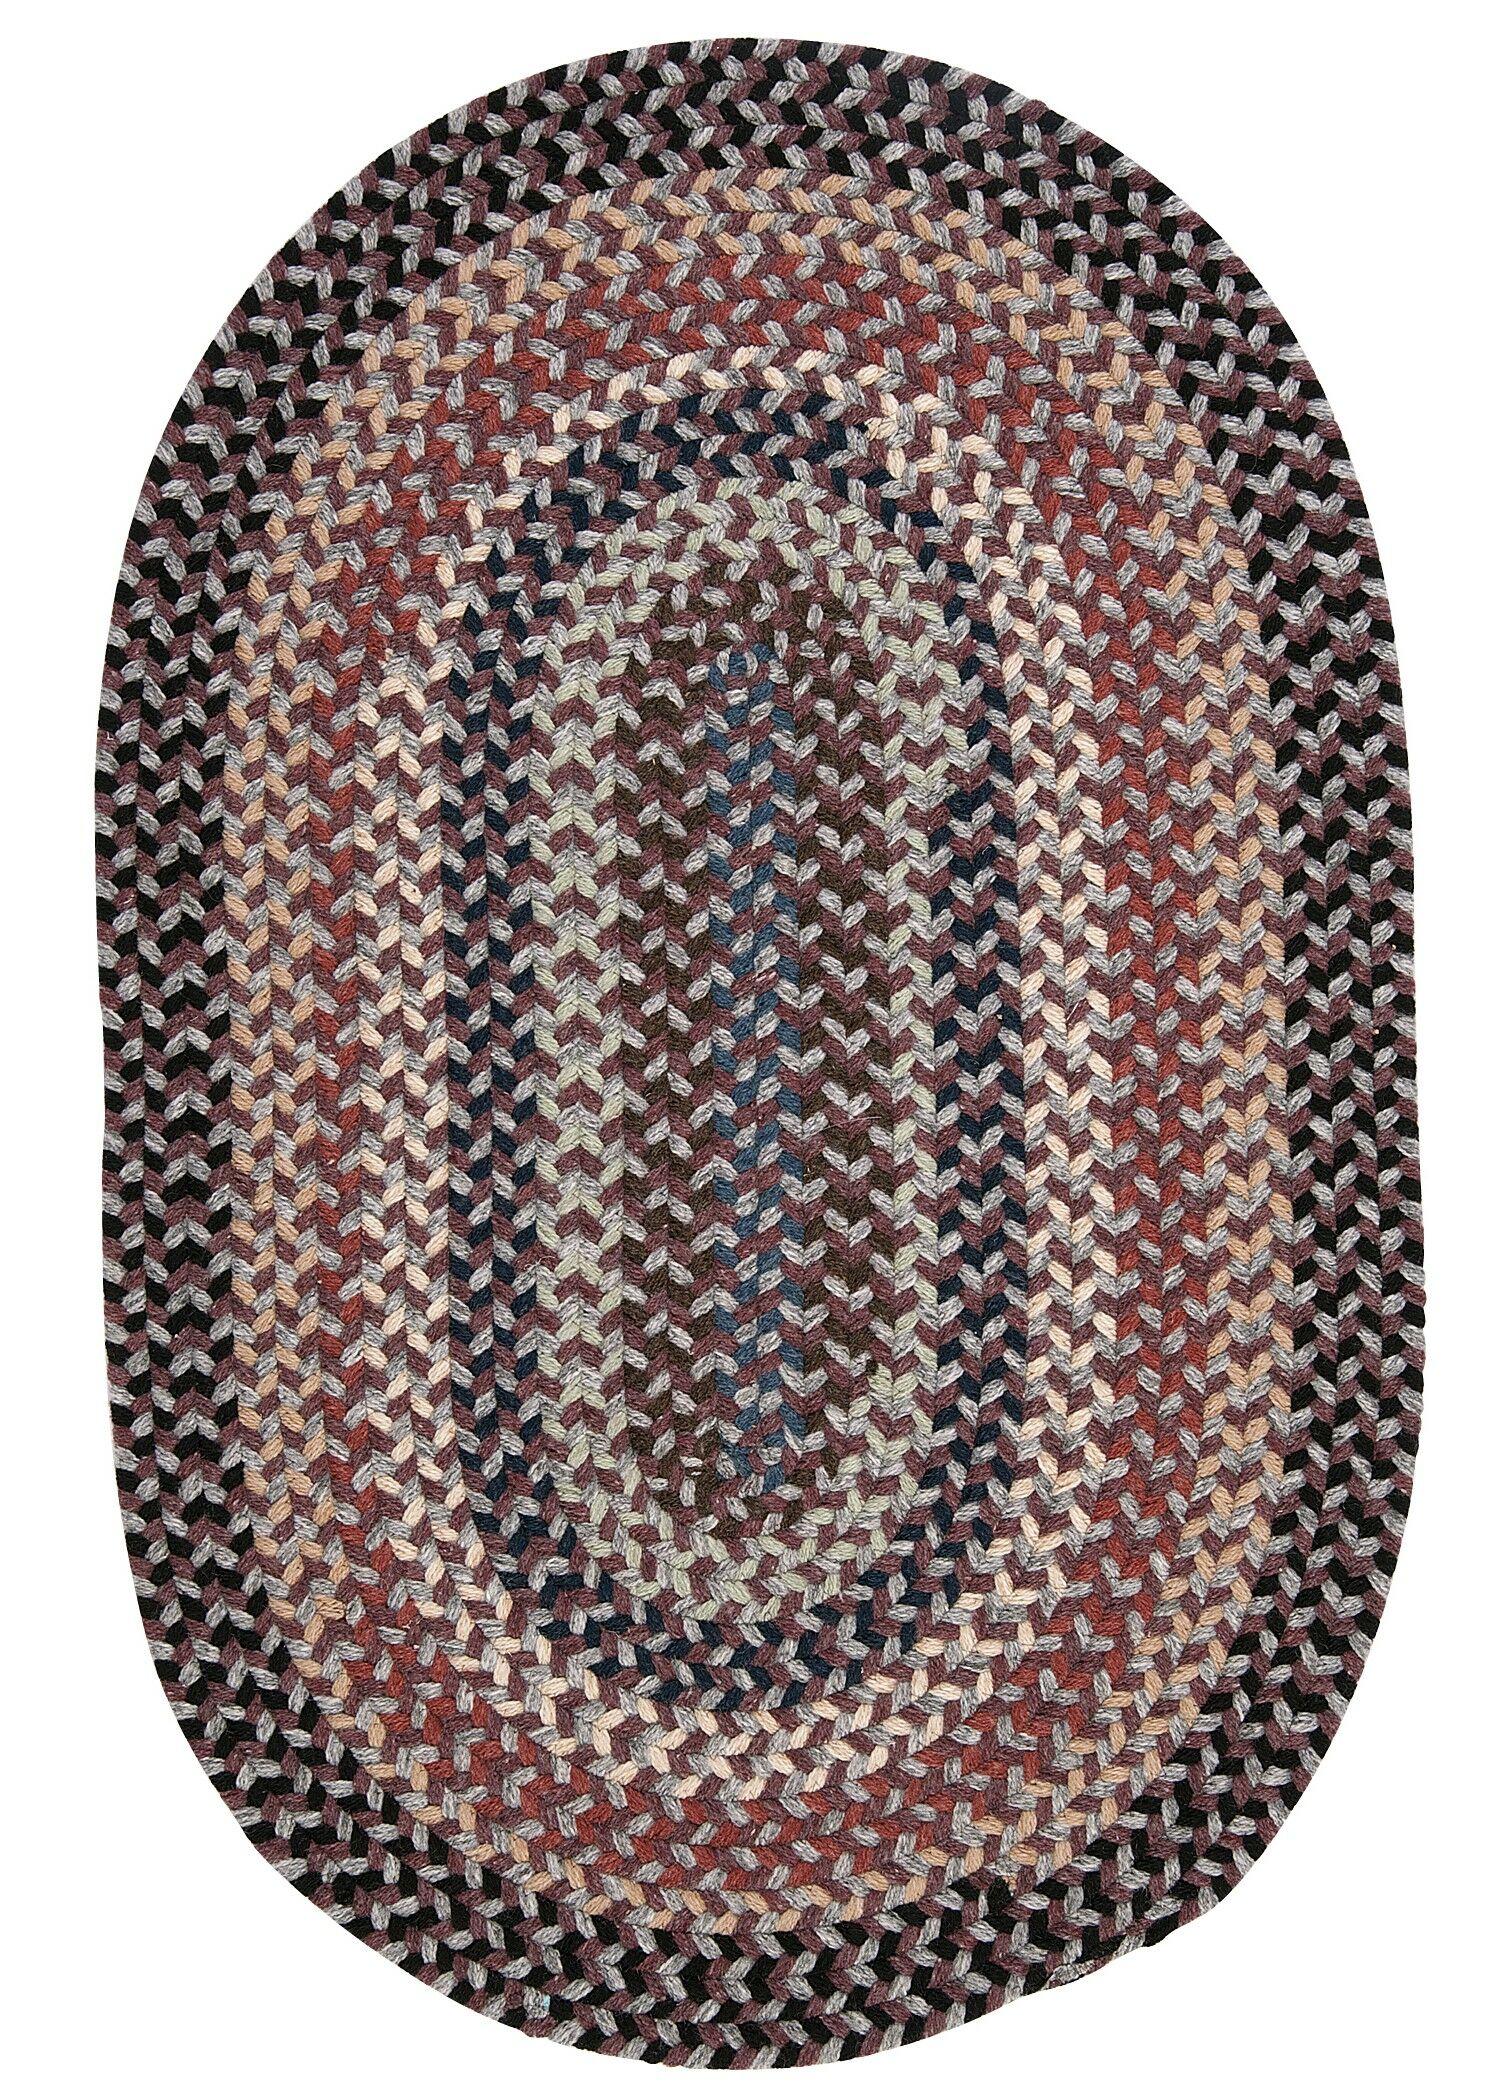 Lettie Purple Area Rug Rug Size: Oval 7' x 9'